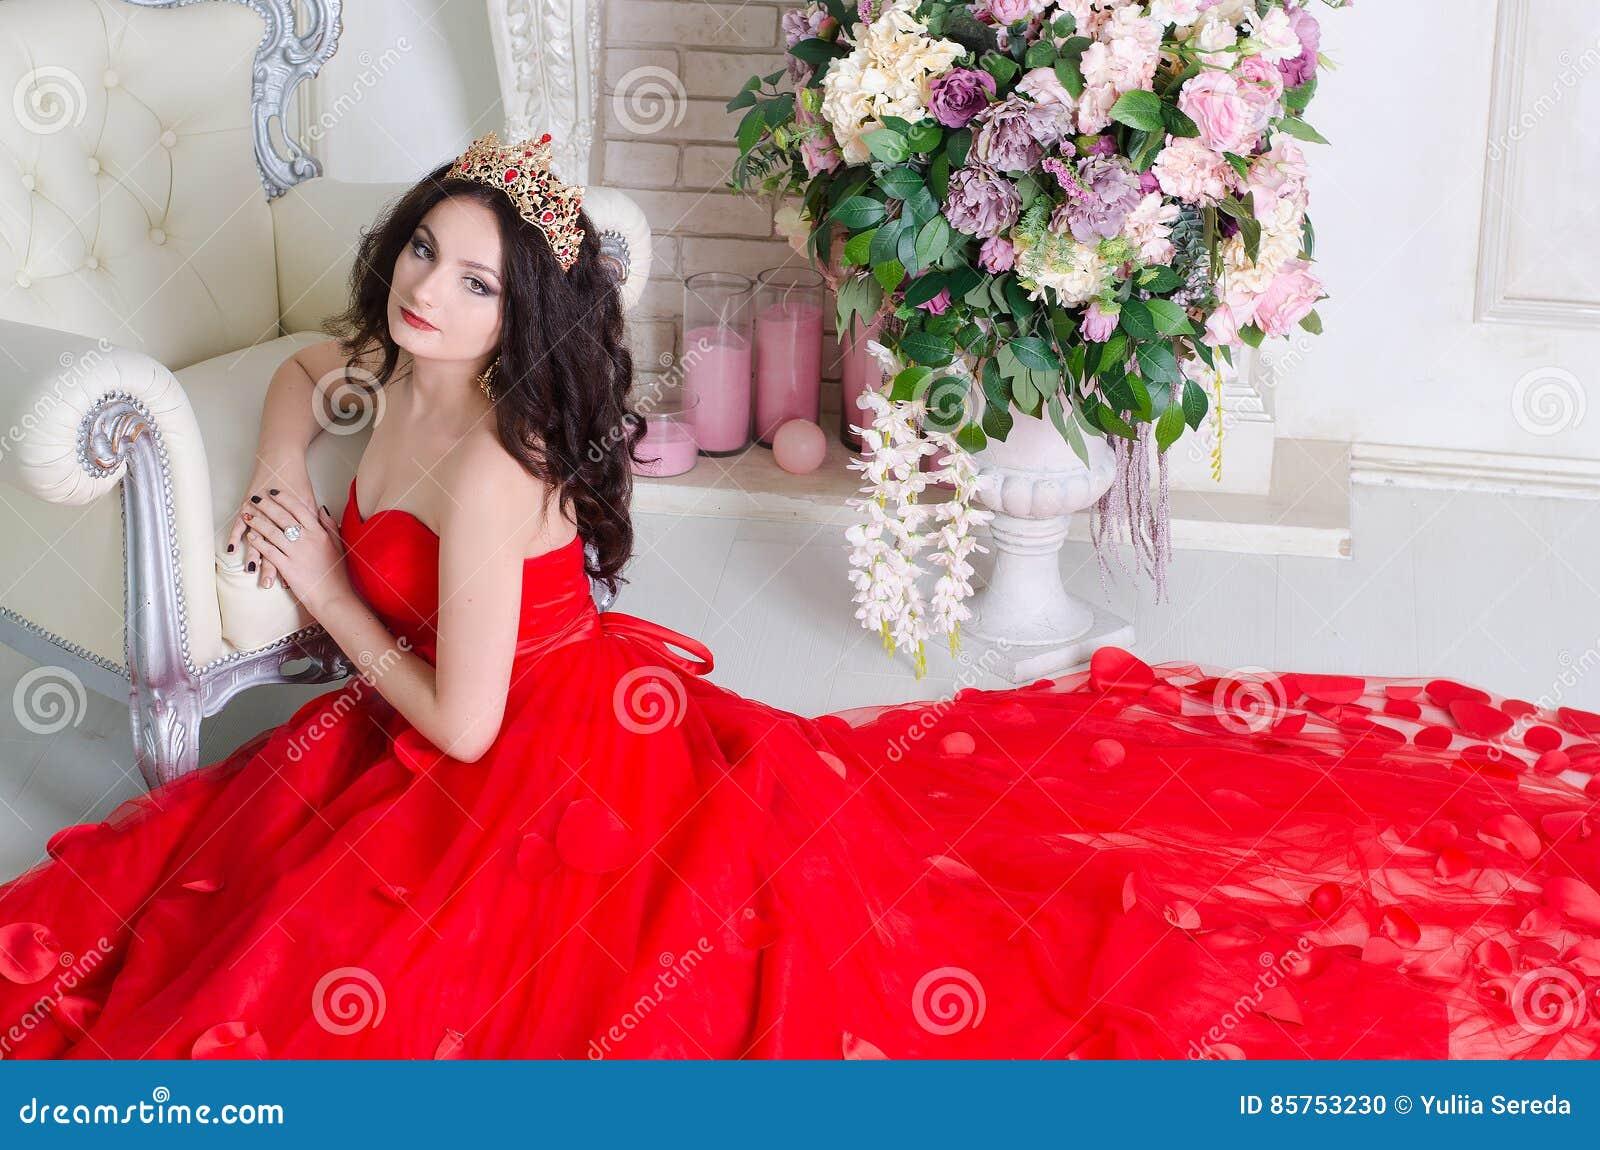 0193604f018e Όμορφη γυναίκα στο κόκκινο μακρύ φόρεμα με μια χρυσή κορώνα και τα  σκουλαρίκια που θέτουν τη συνεδρίαση στο πάτωμα κοντά στην καρέκλα